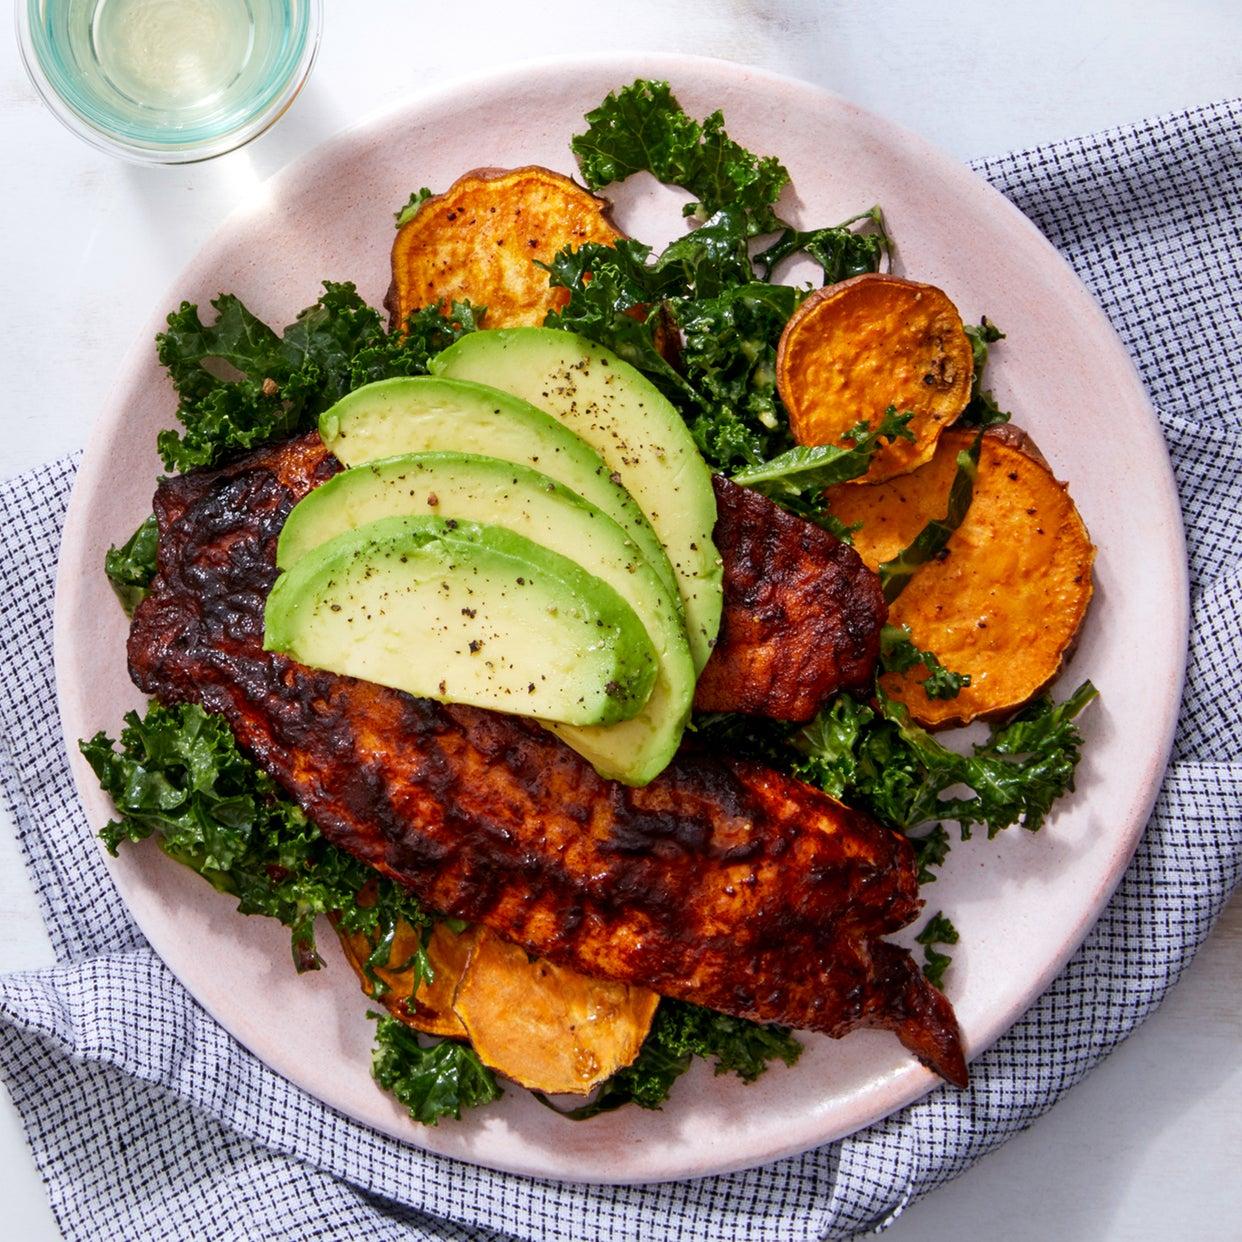 Sweet & Smoky Seared Tilapia with Kale Salad & Roasted Sweet Potatoes